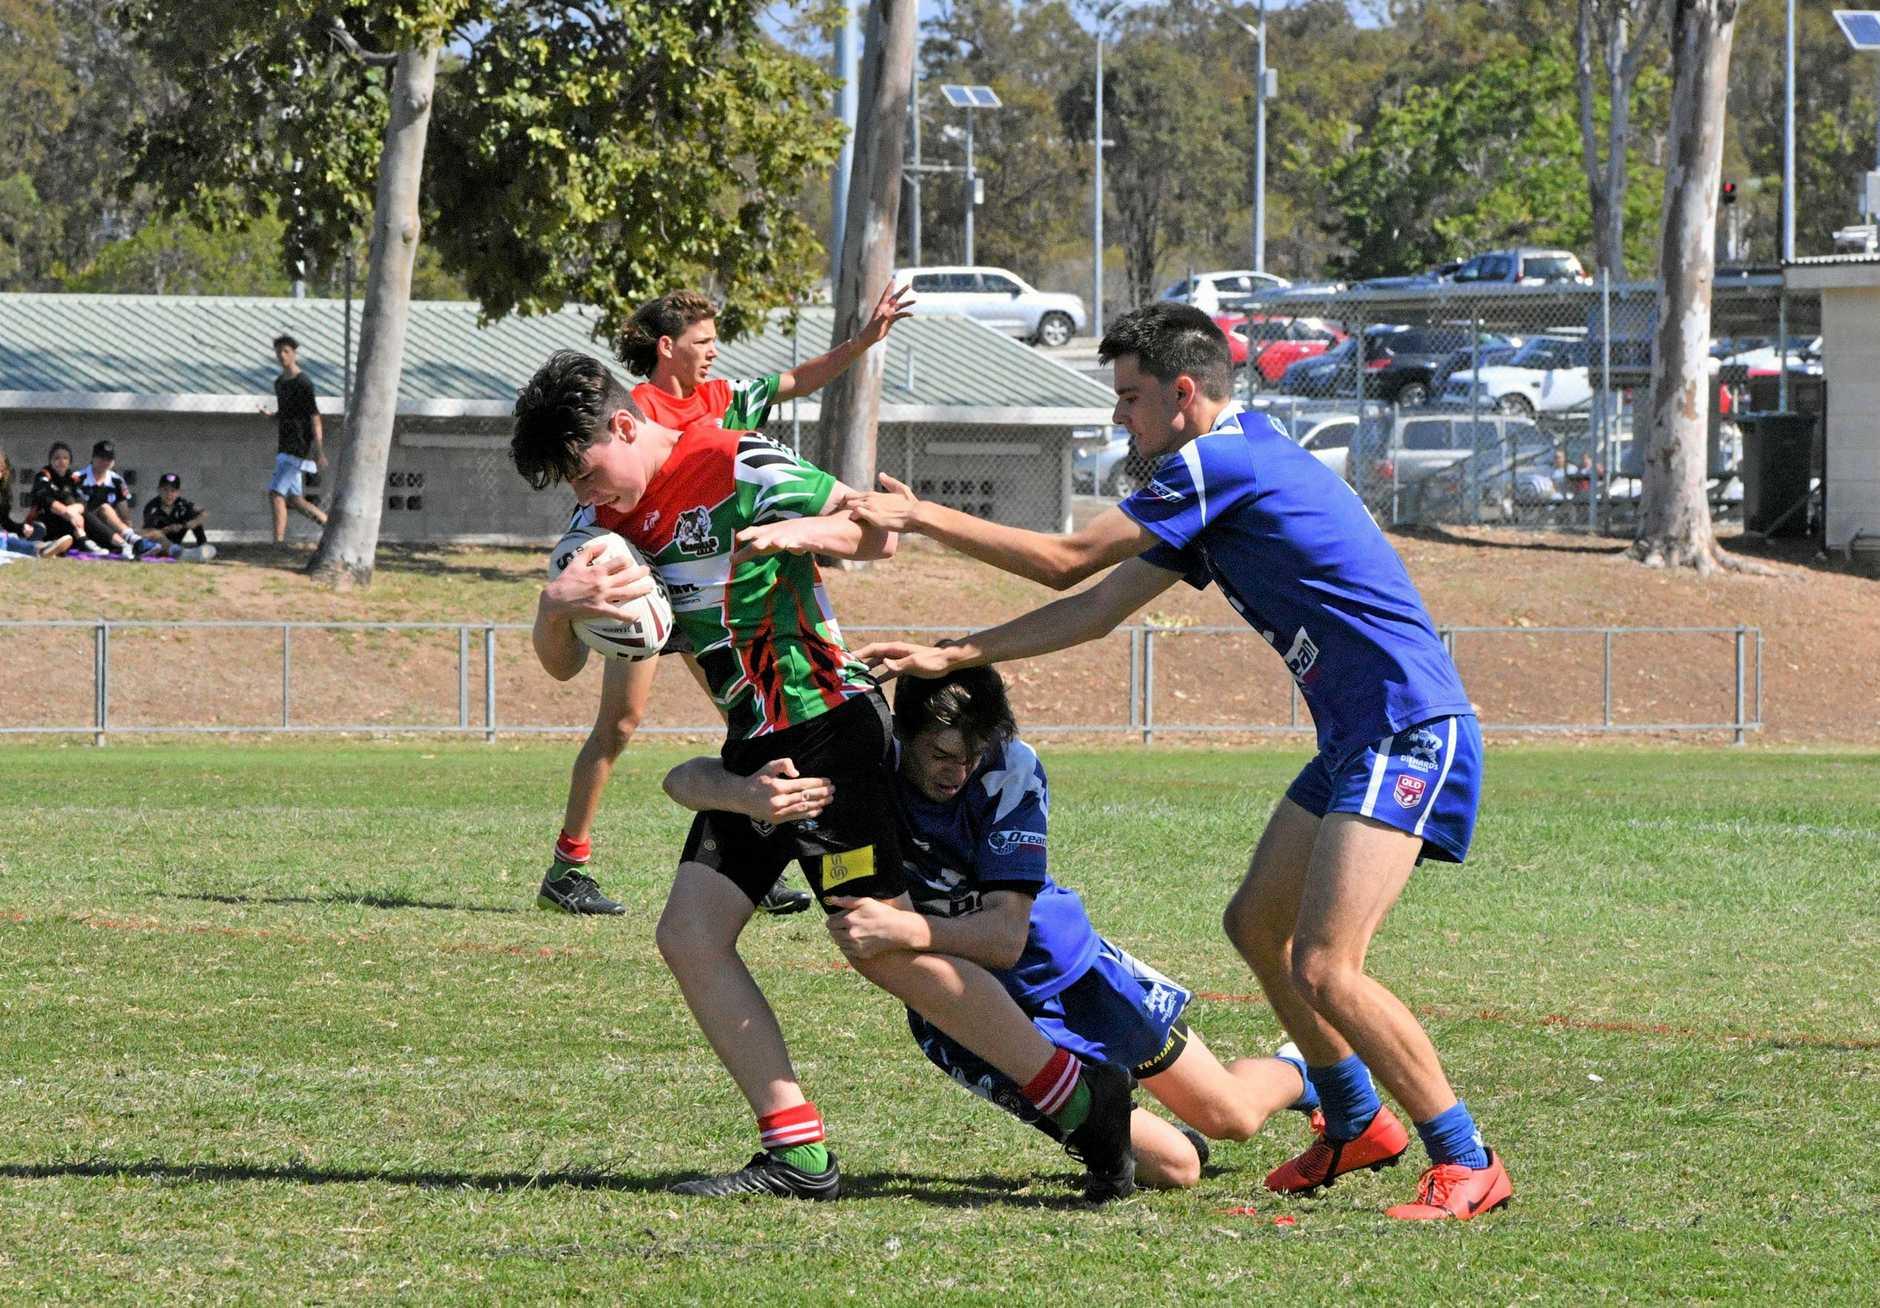 Tannum's U15 player Jack Westlake, Valleys players Logan Slade (around legs) and Ethan Malone.